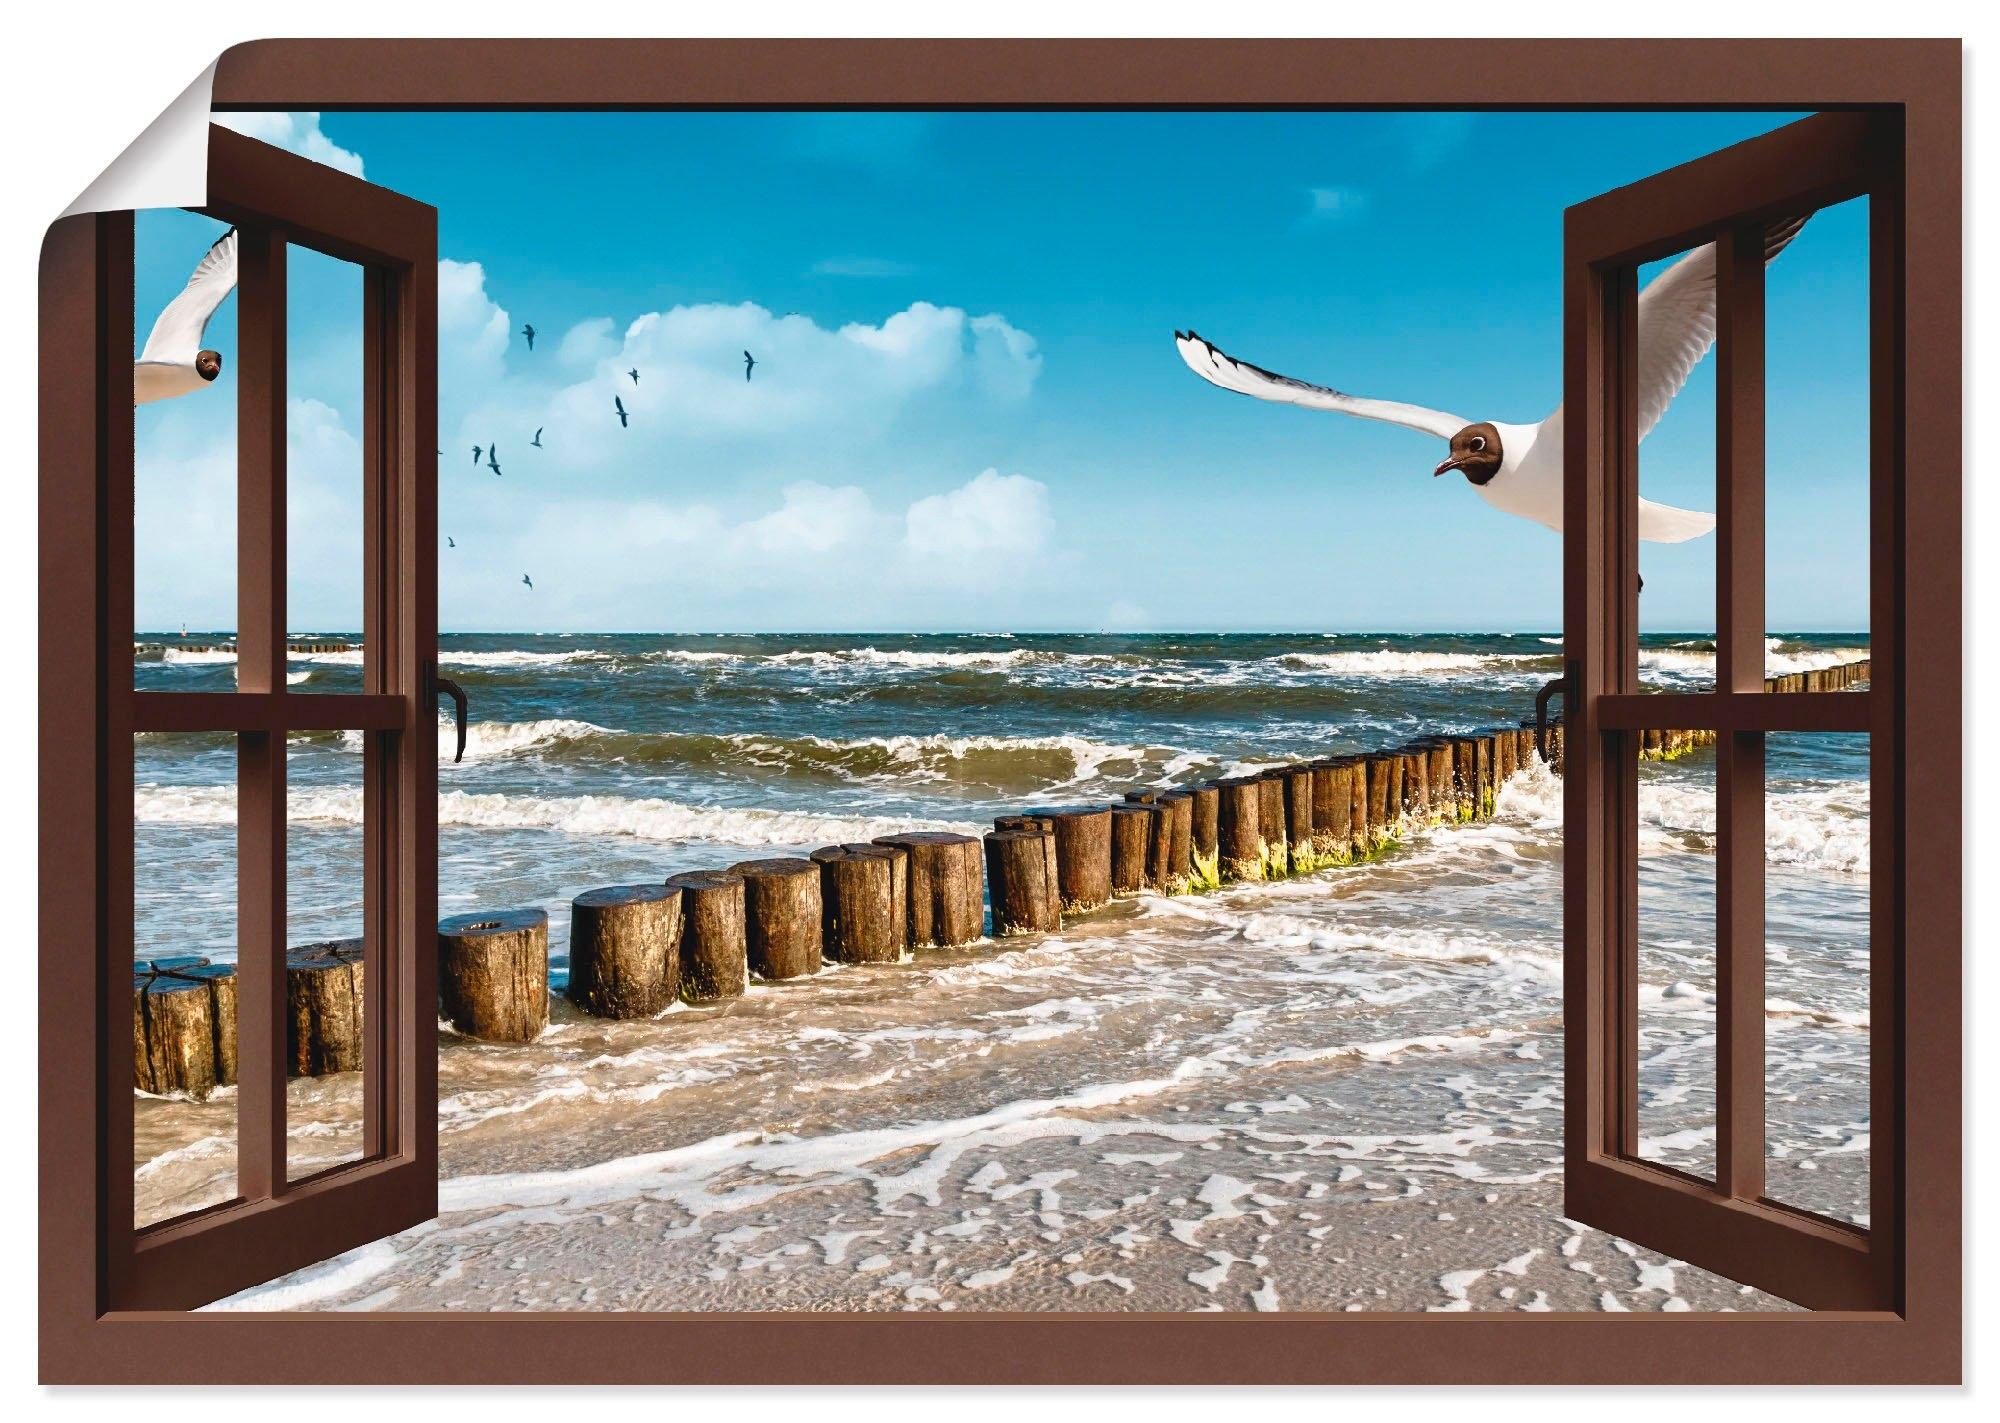 Artland artprint »Fensterblick - Ostsee« veilig op otto.nl kopen